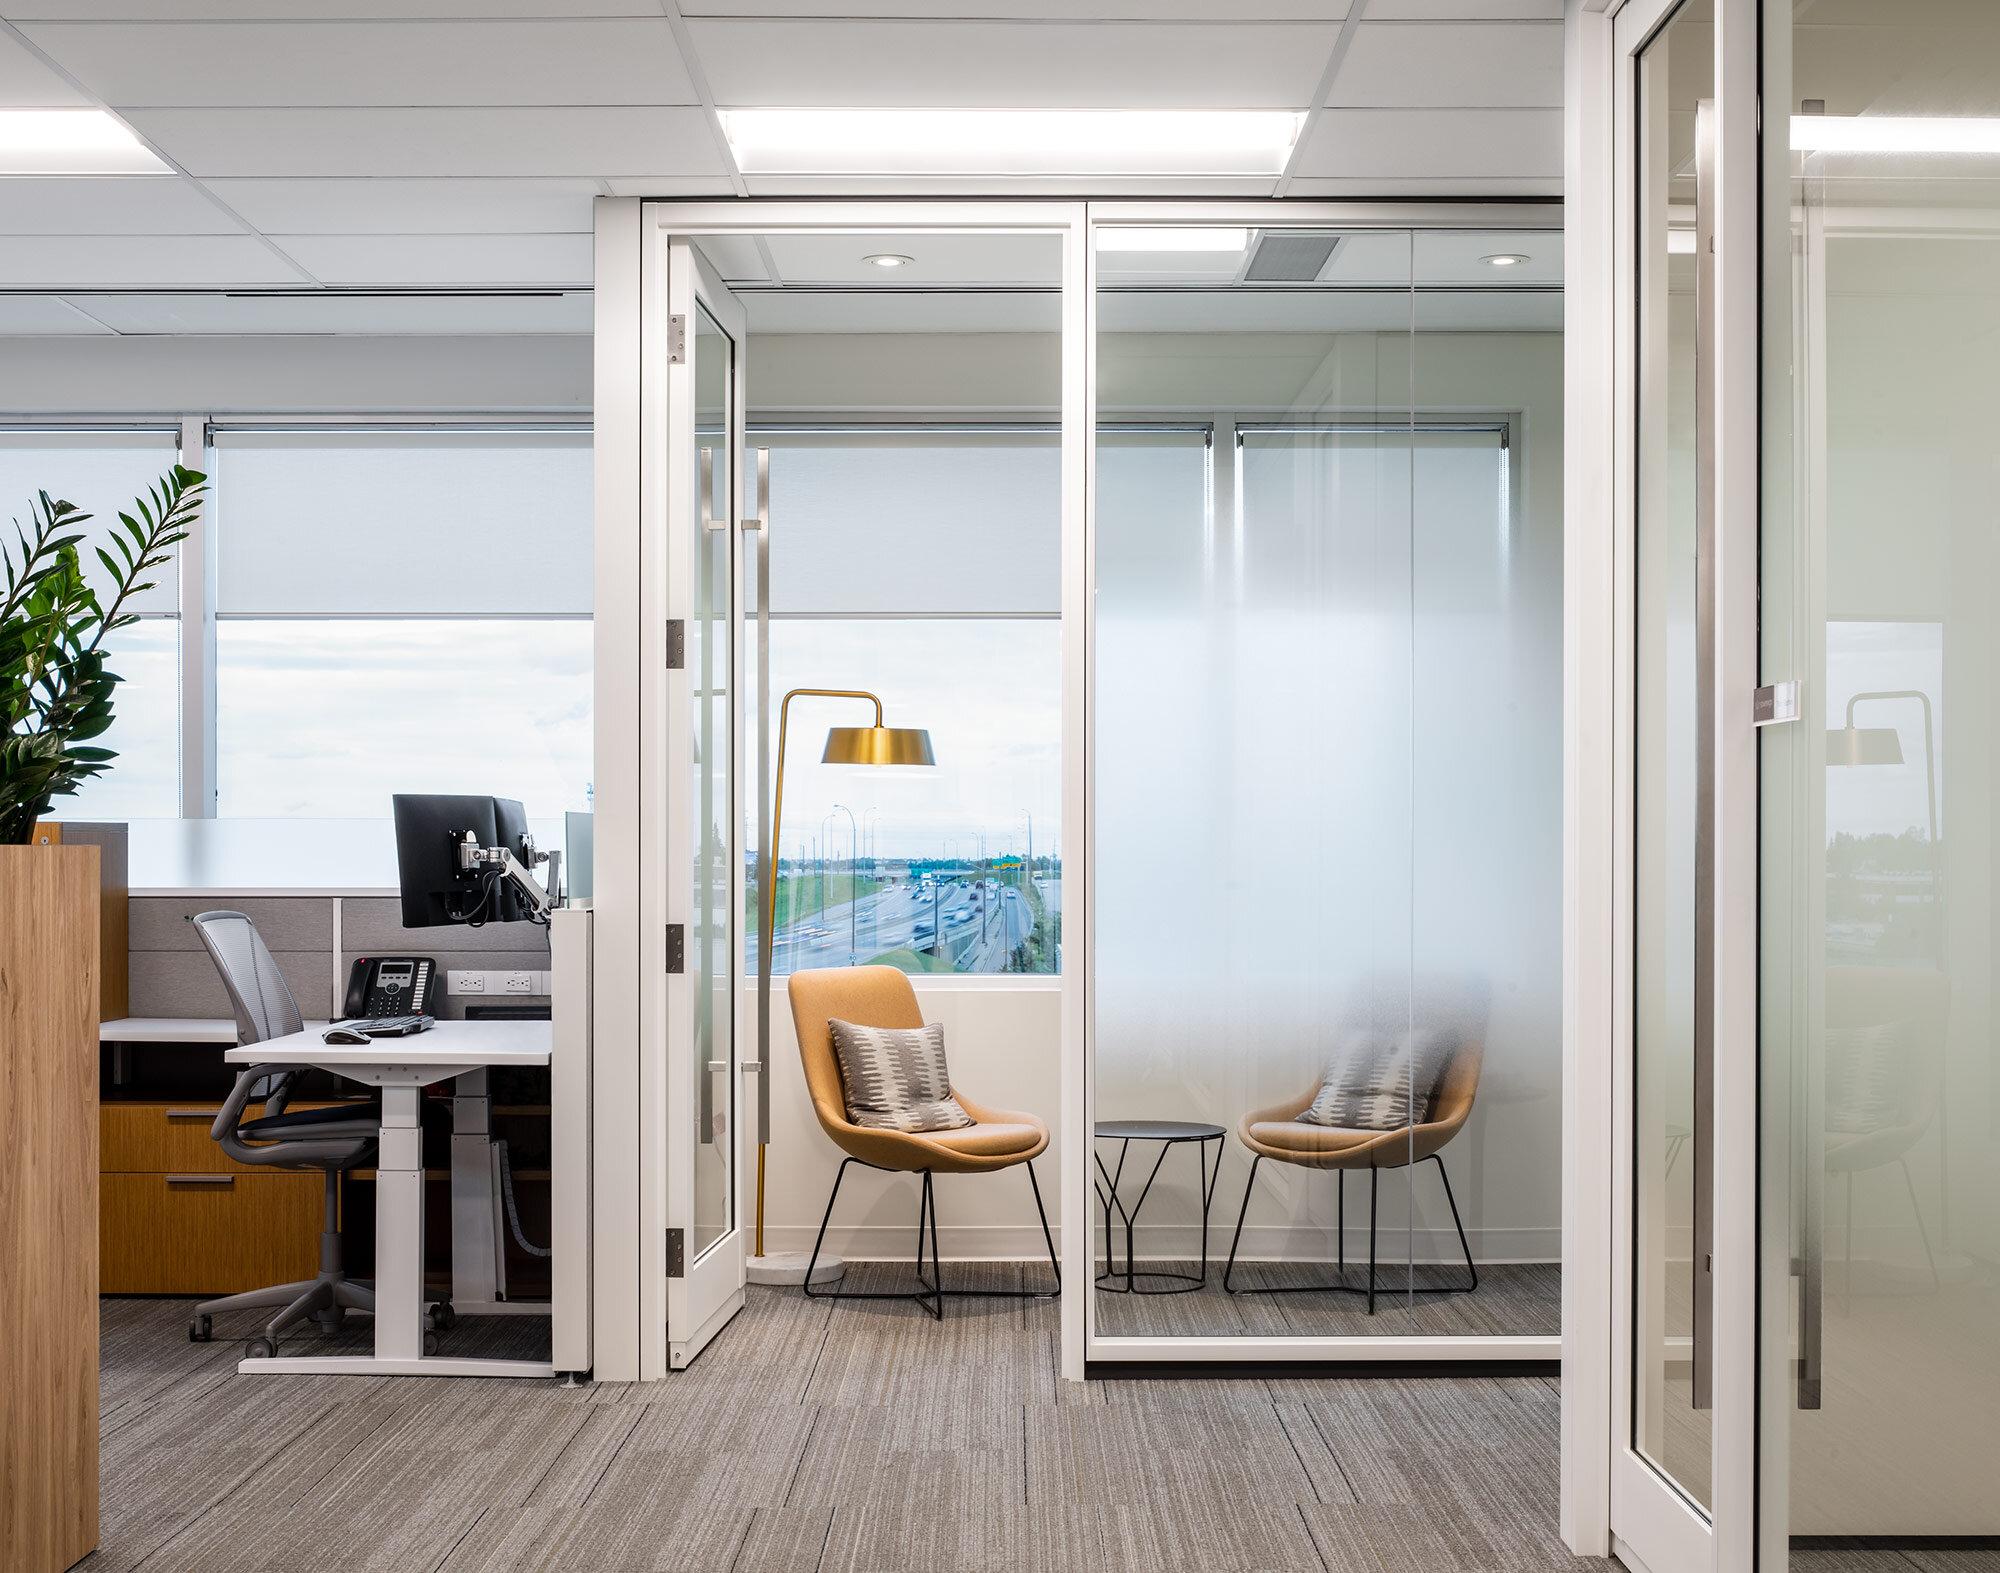 Insurance-services-interior-design-office-calgary-meeting-room.jpg